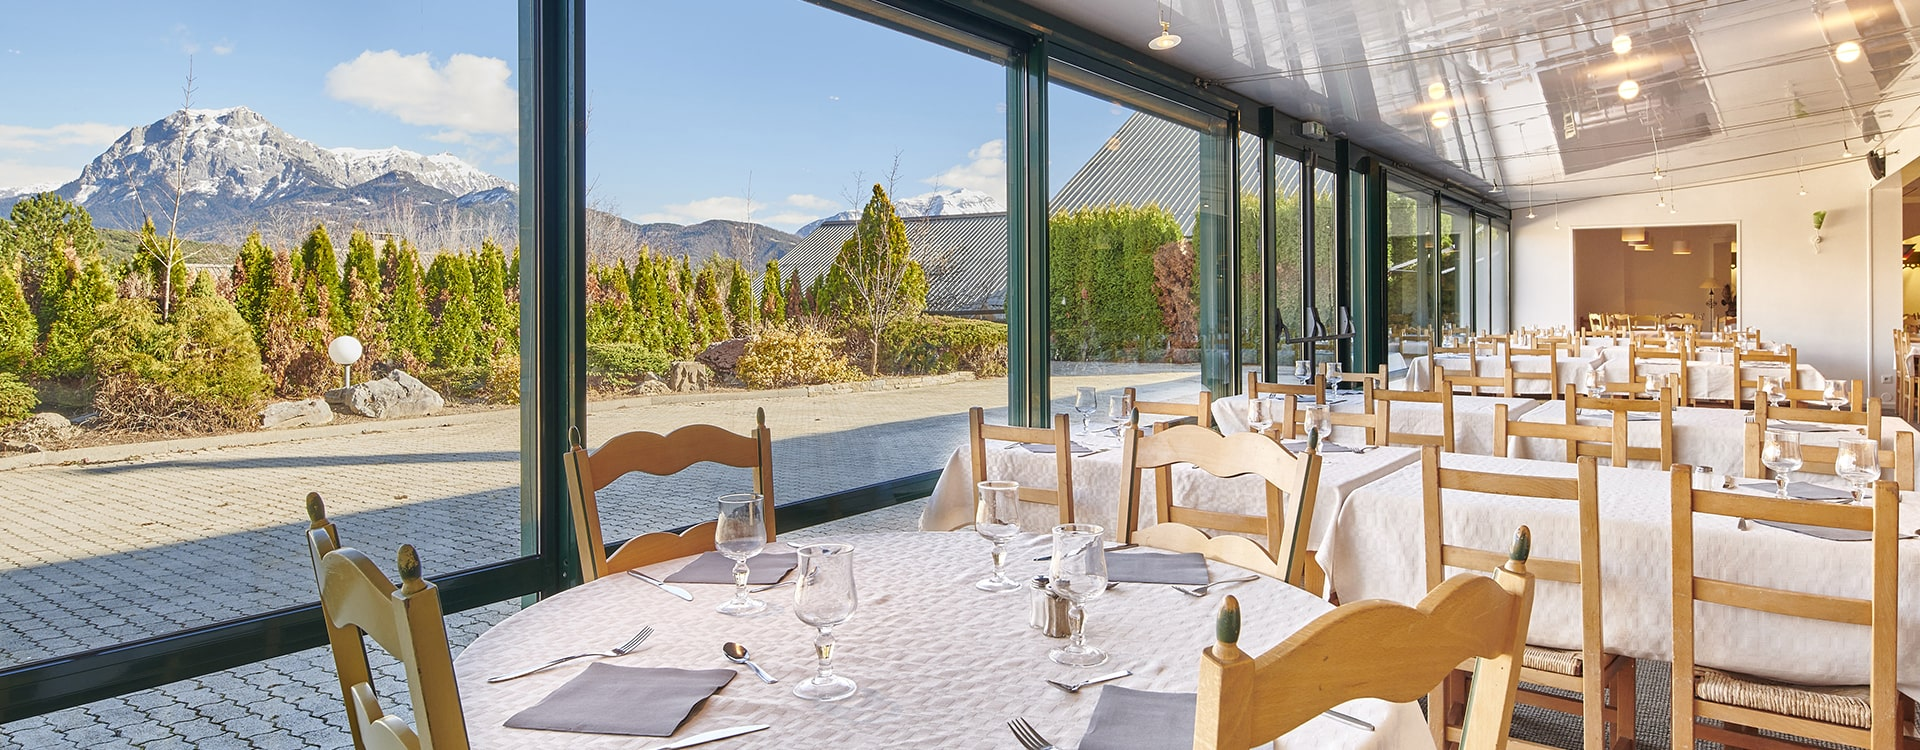 Restaurant Horizons du Lac